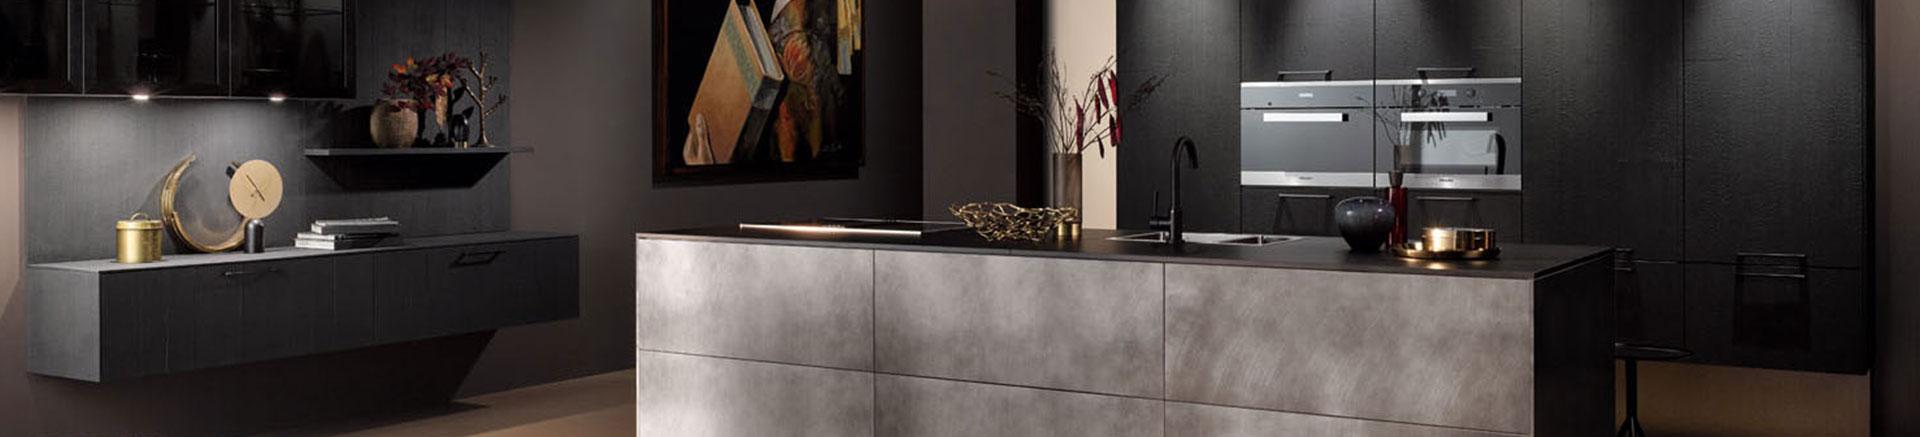 conception cuisine vers clermont ferrand id cuisines conseils mozac. Black Bedroom Furniture Sets. Home Design Ideas